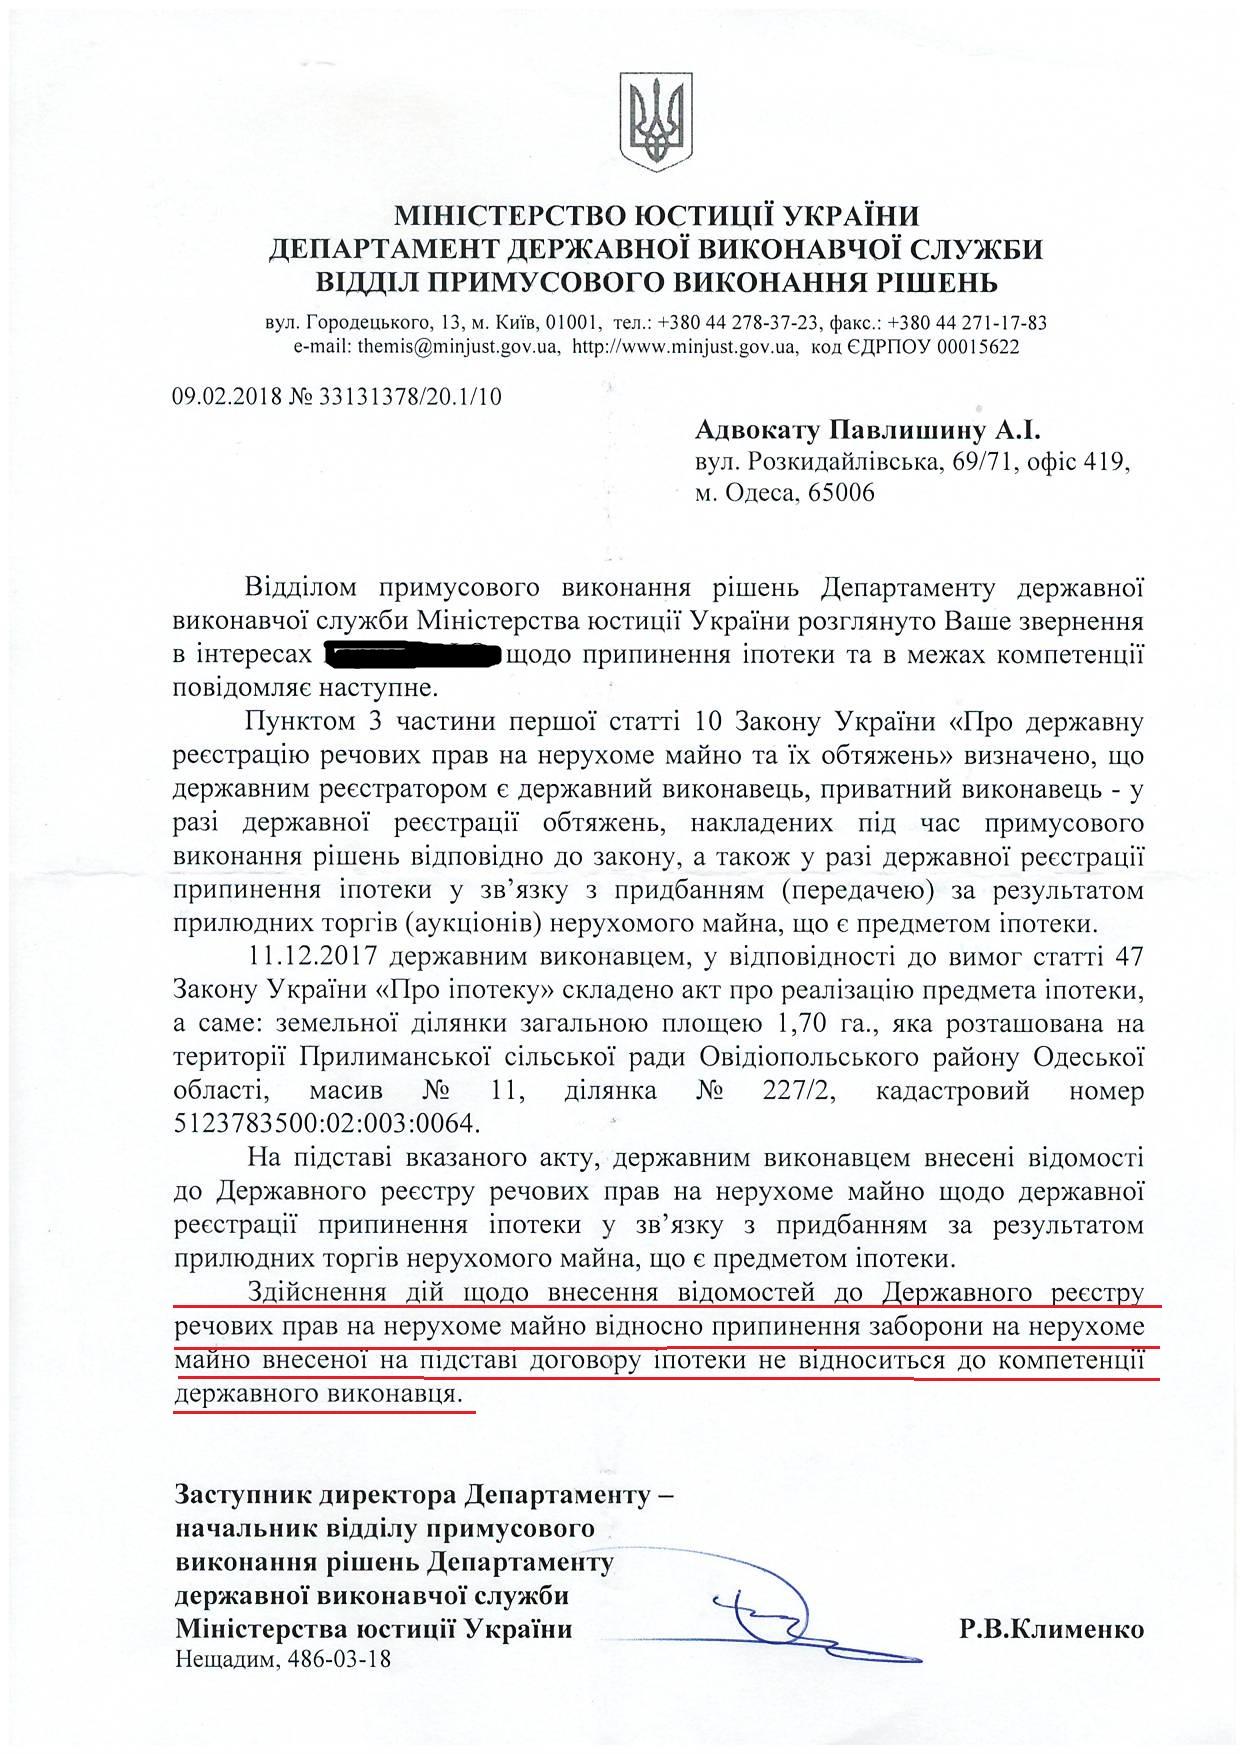 image http://forum.setam.net.ua/assets/images/79-5lYHTDM9e1aCwUJ5.jpeg